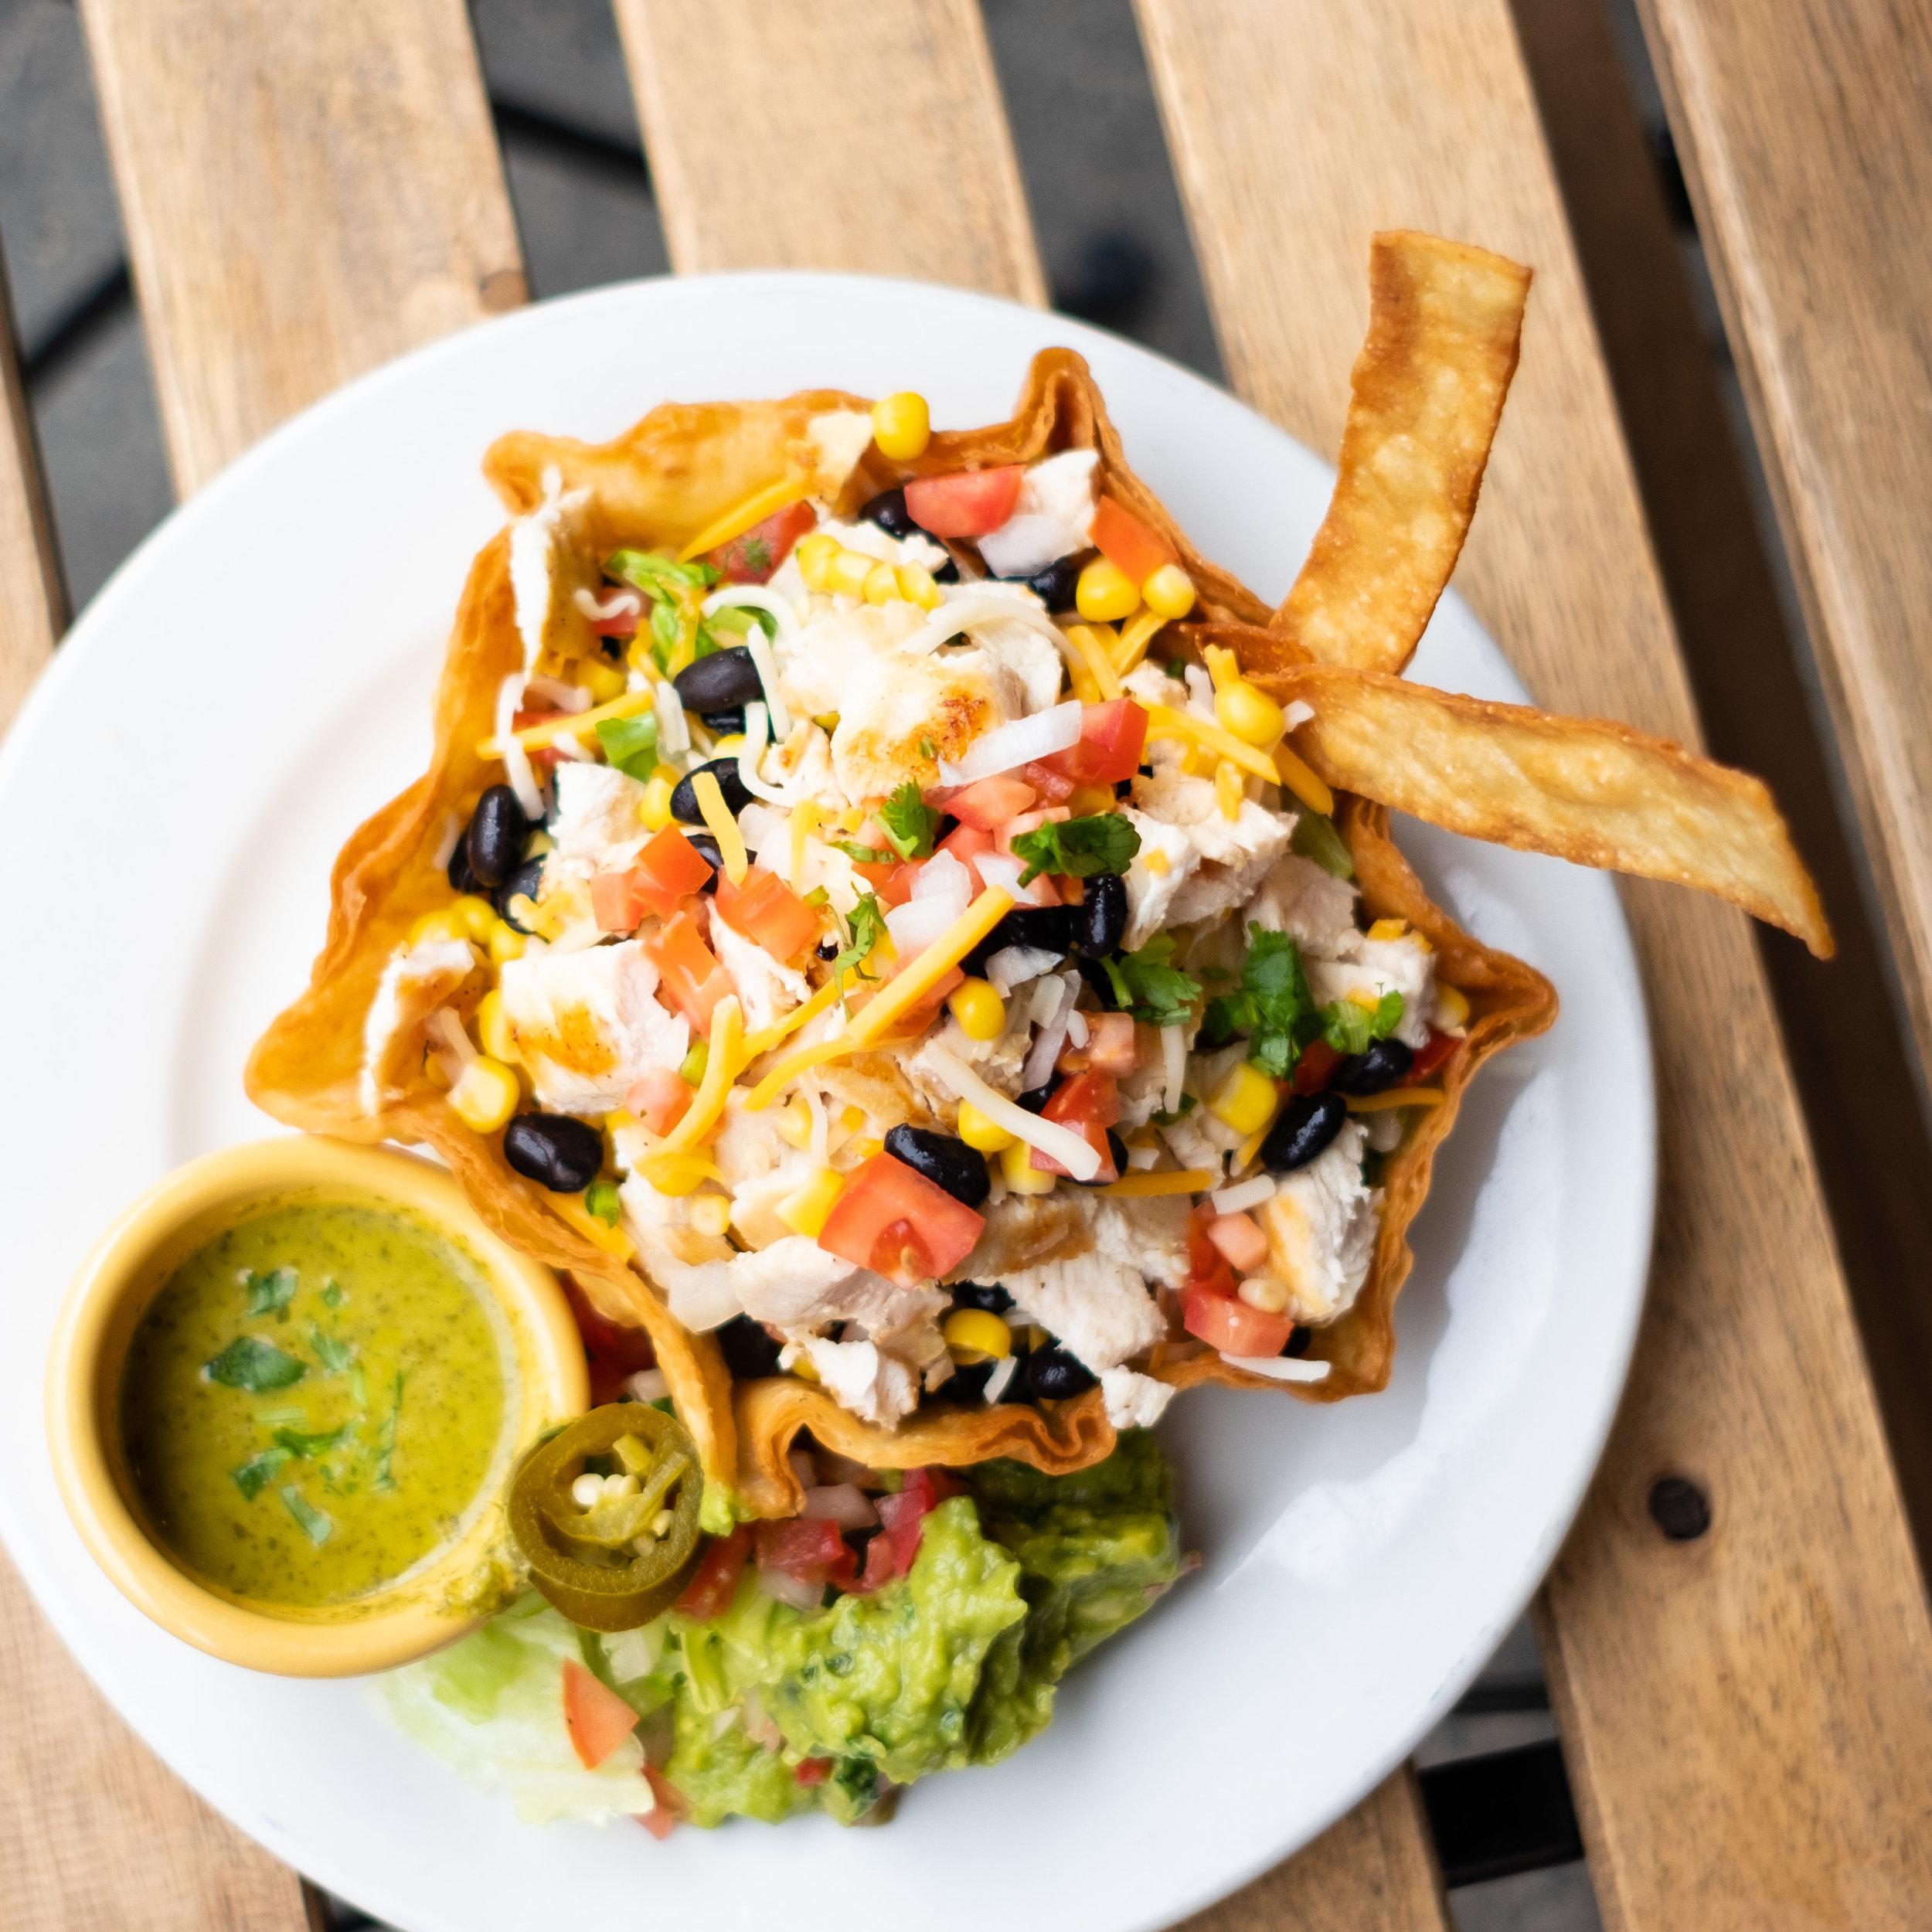 ABOUT US - An institution in Hoboken since 1983,East LA serves Tex-Mex favoritesand the best margaritas in Hoboken.